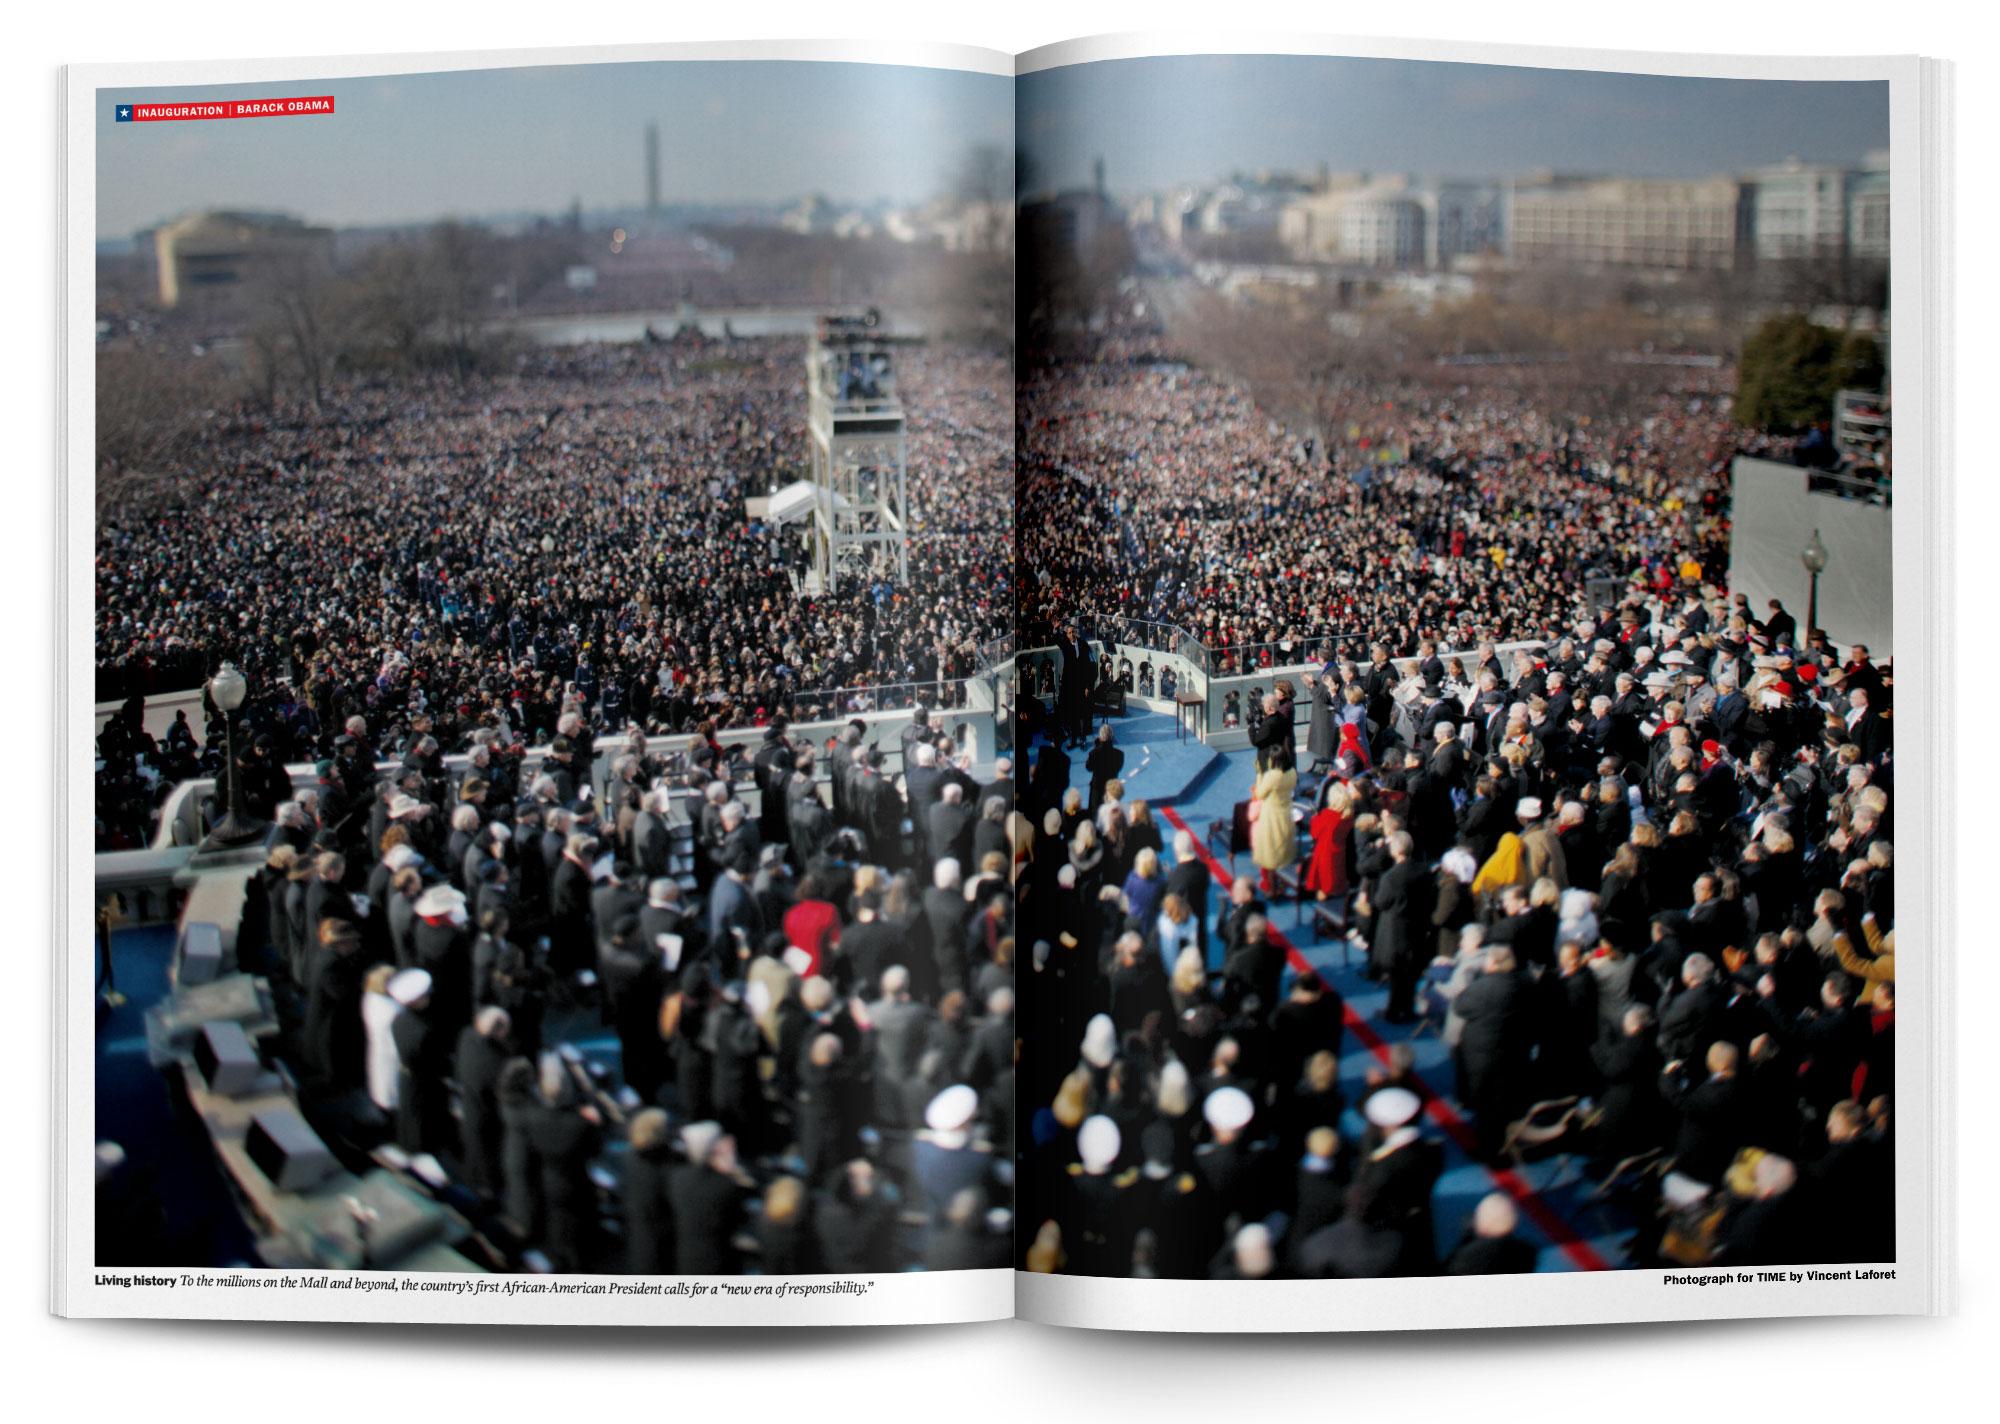 layouts.obamainaug2.jpg